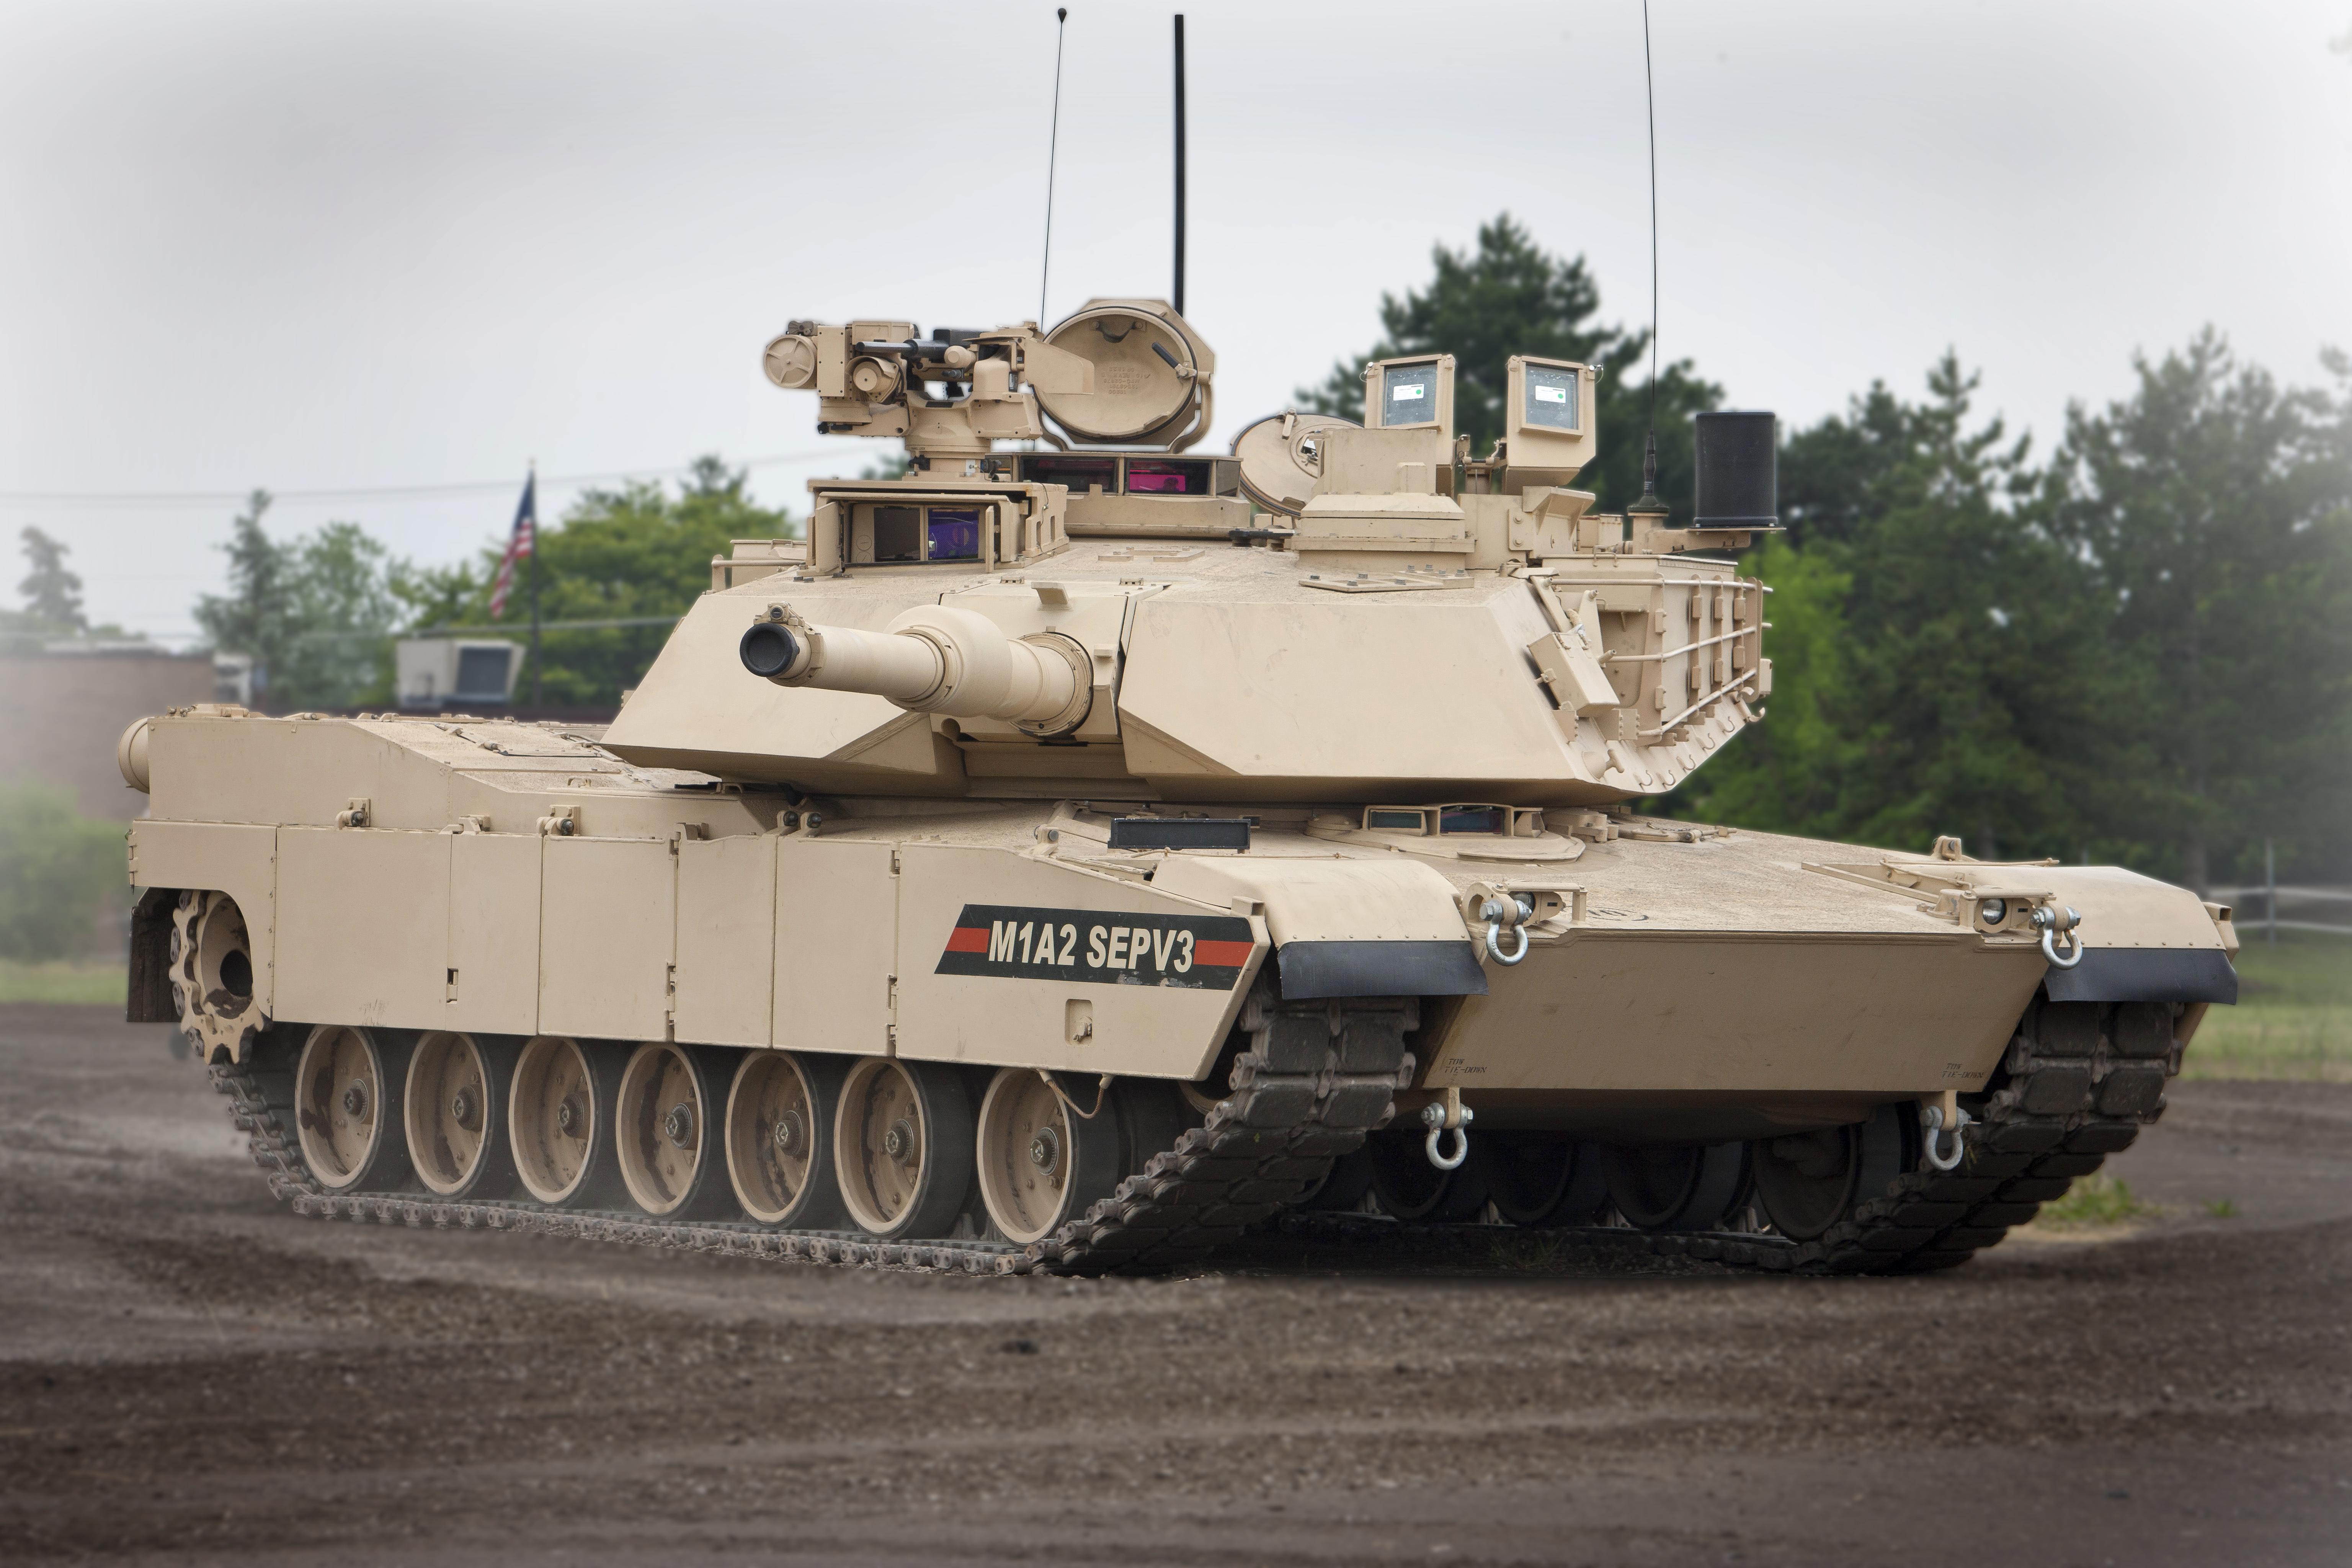 General Dynamics Land Systems M1A2 SEPv3